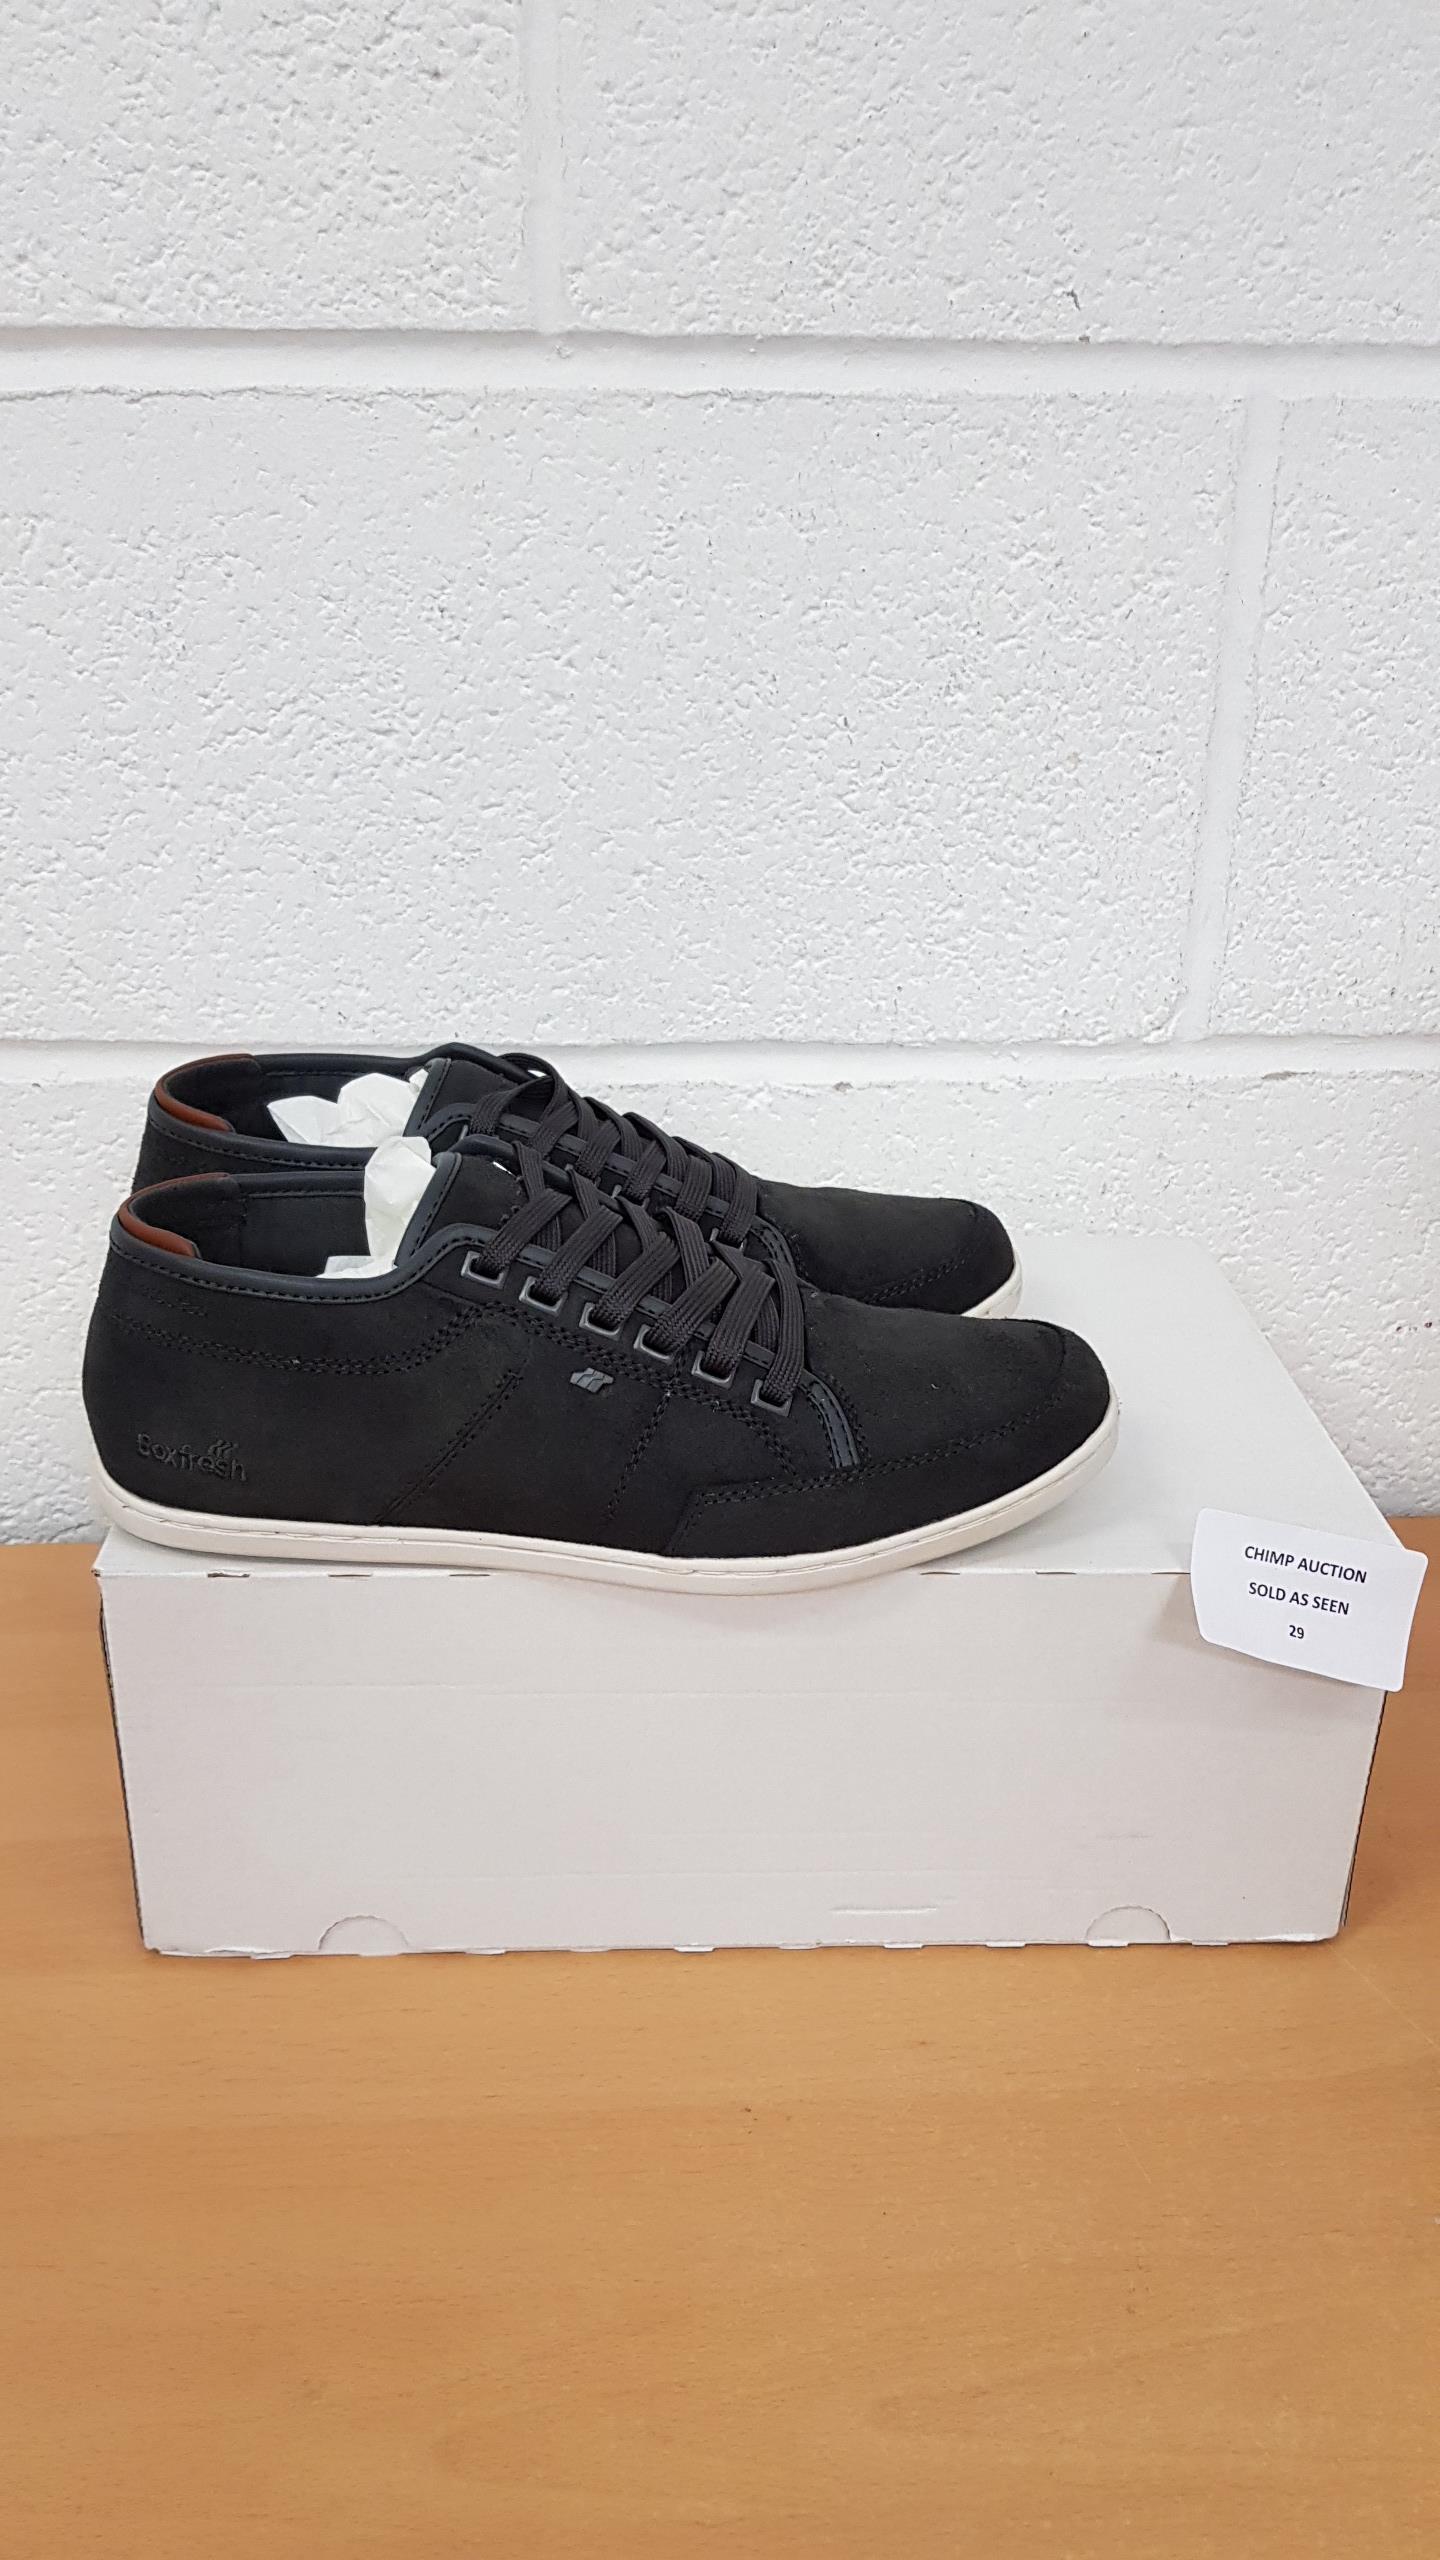 Lot 29 - Boxfresh men's shoes UK 7